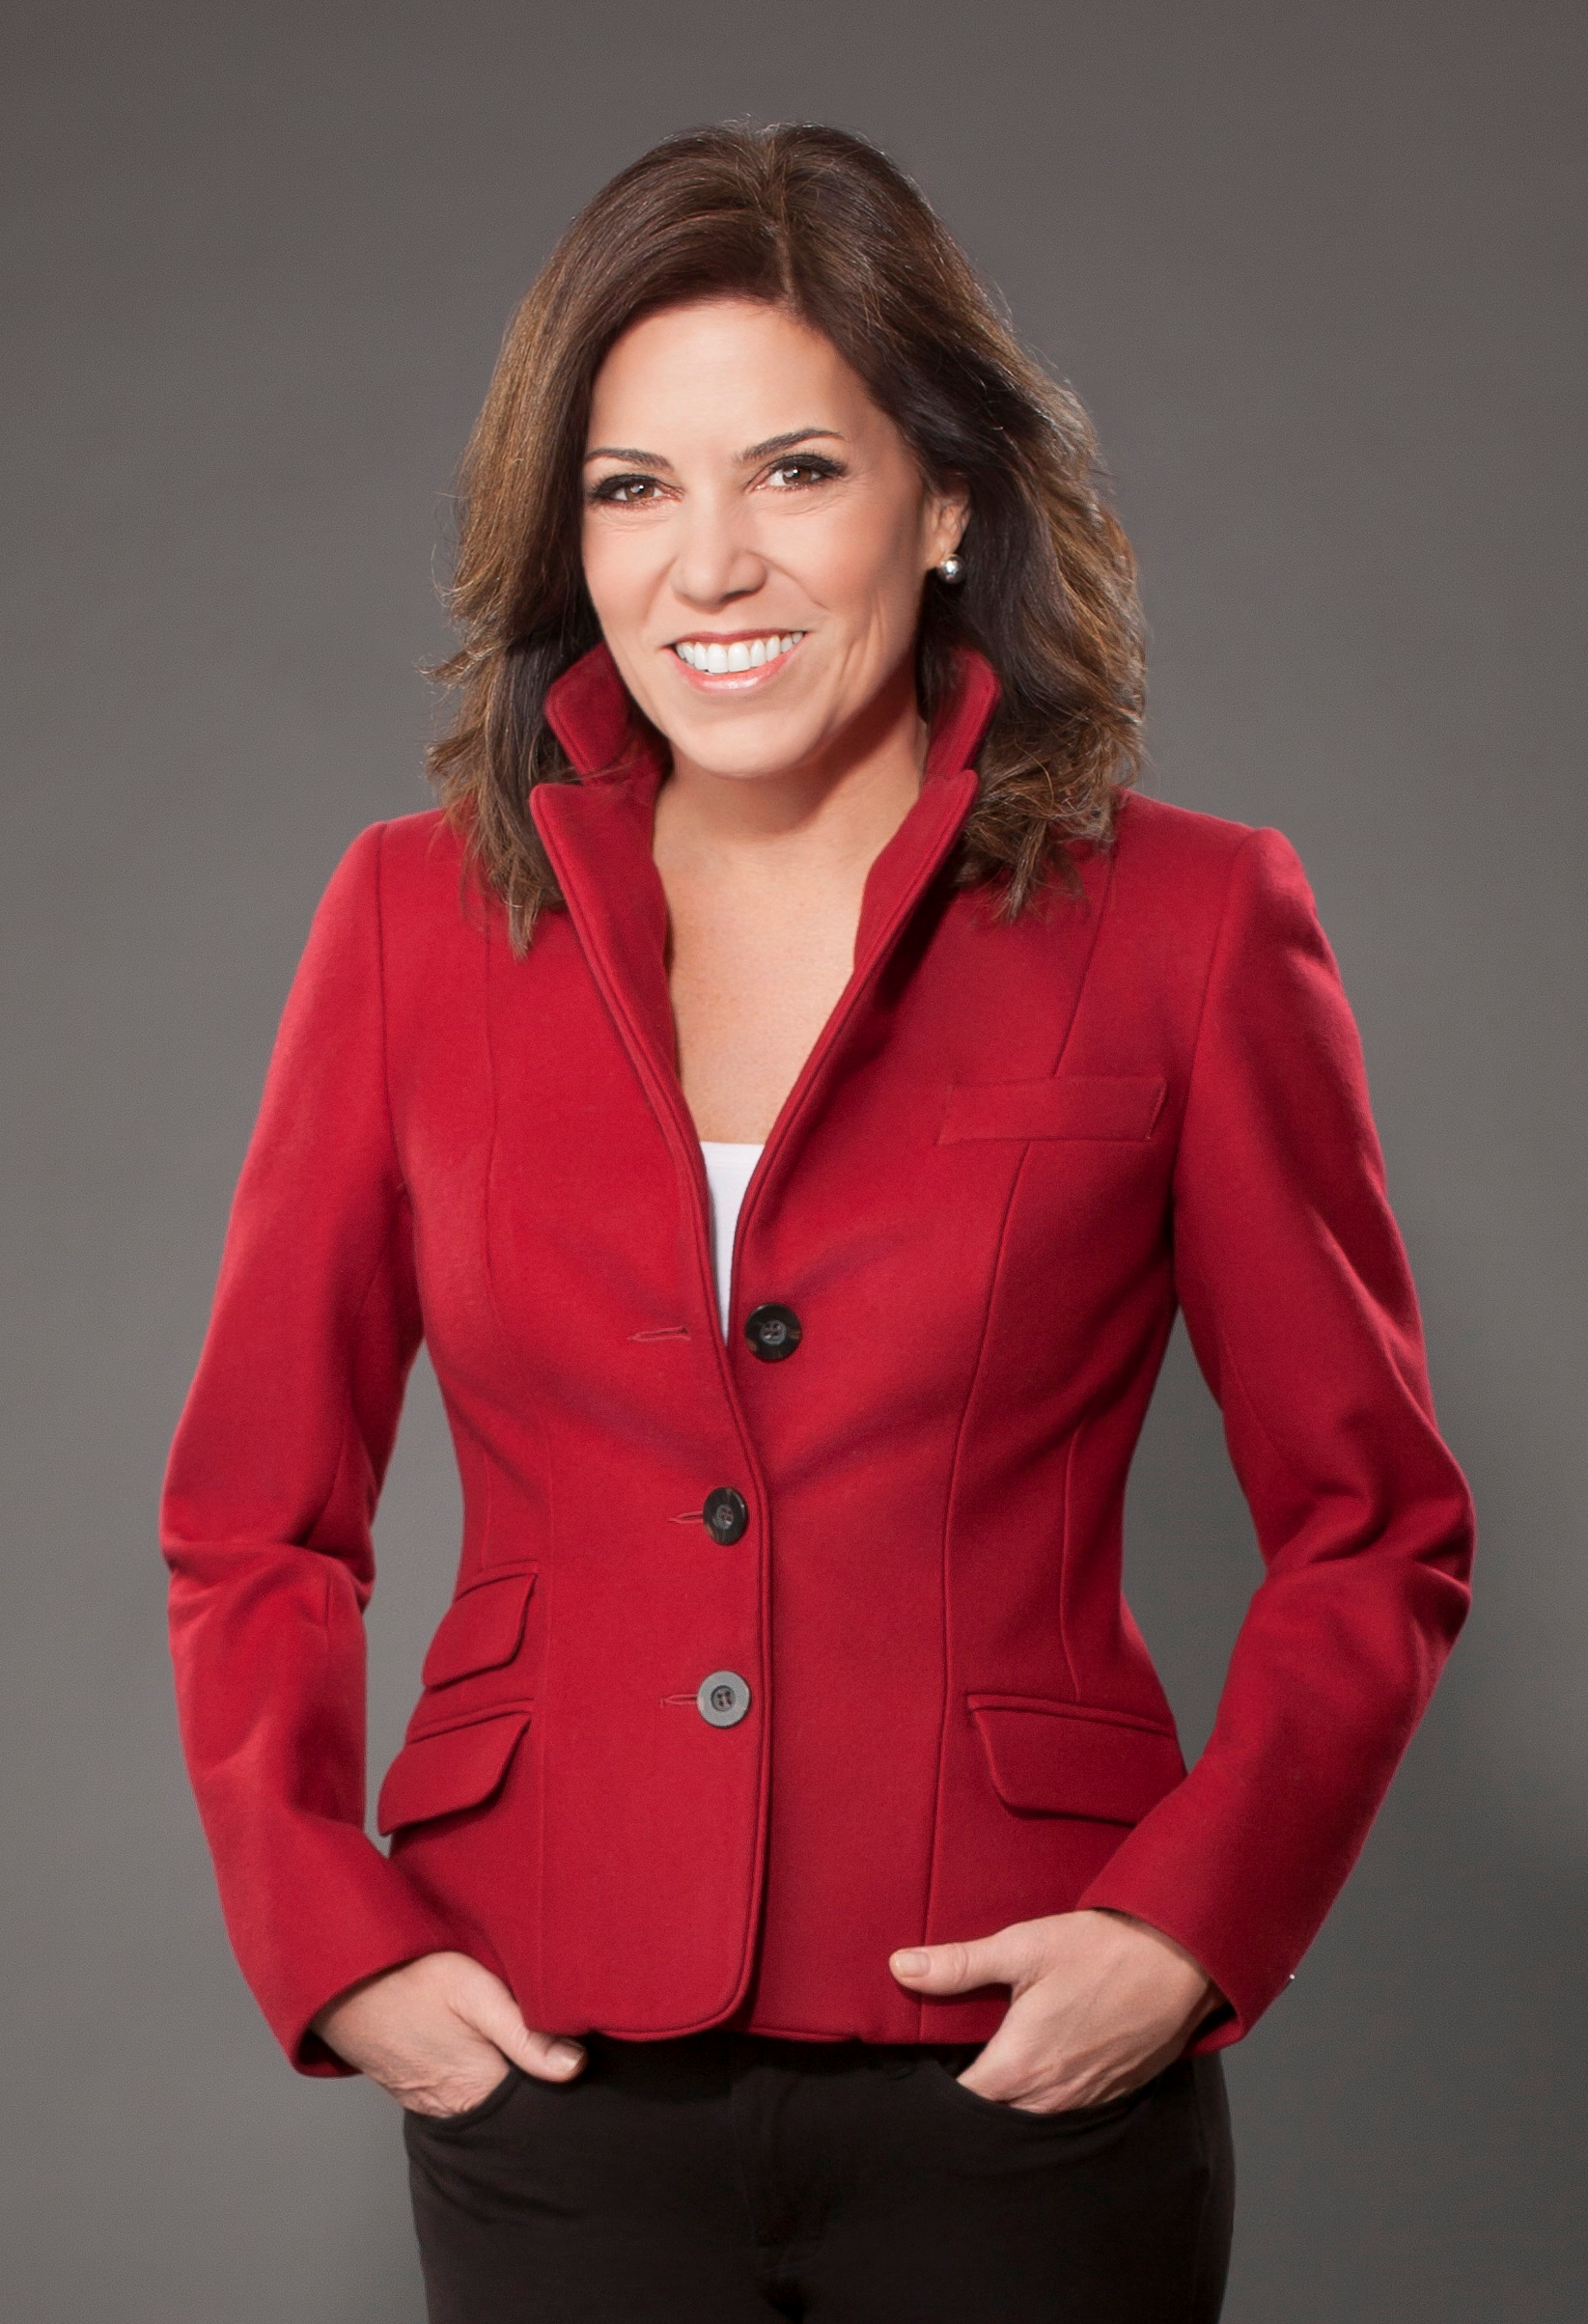 MICHELE TAFOYA | NBC Sports Pressbox